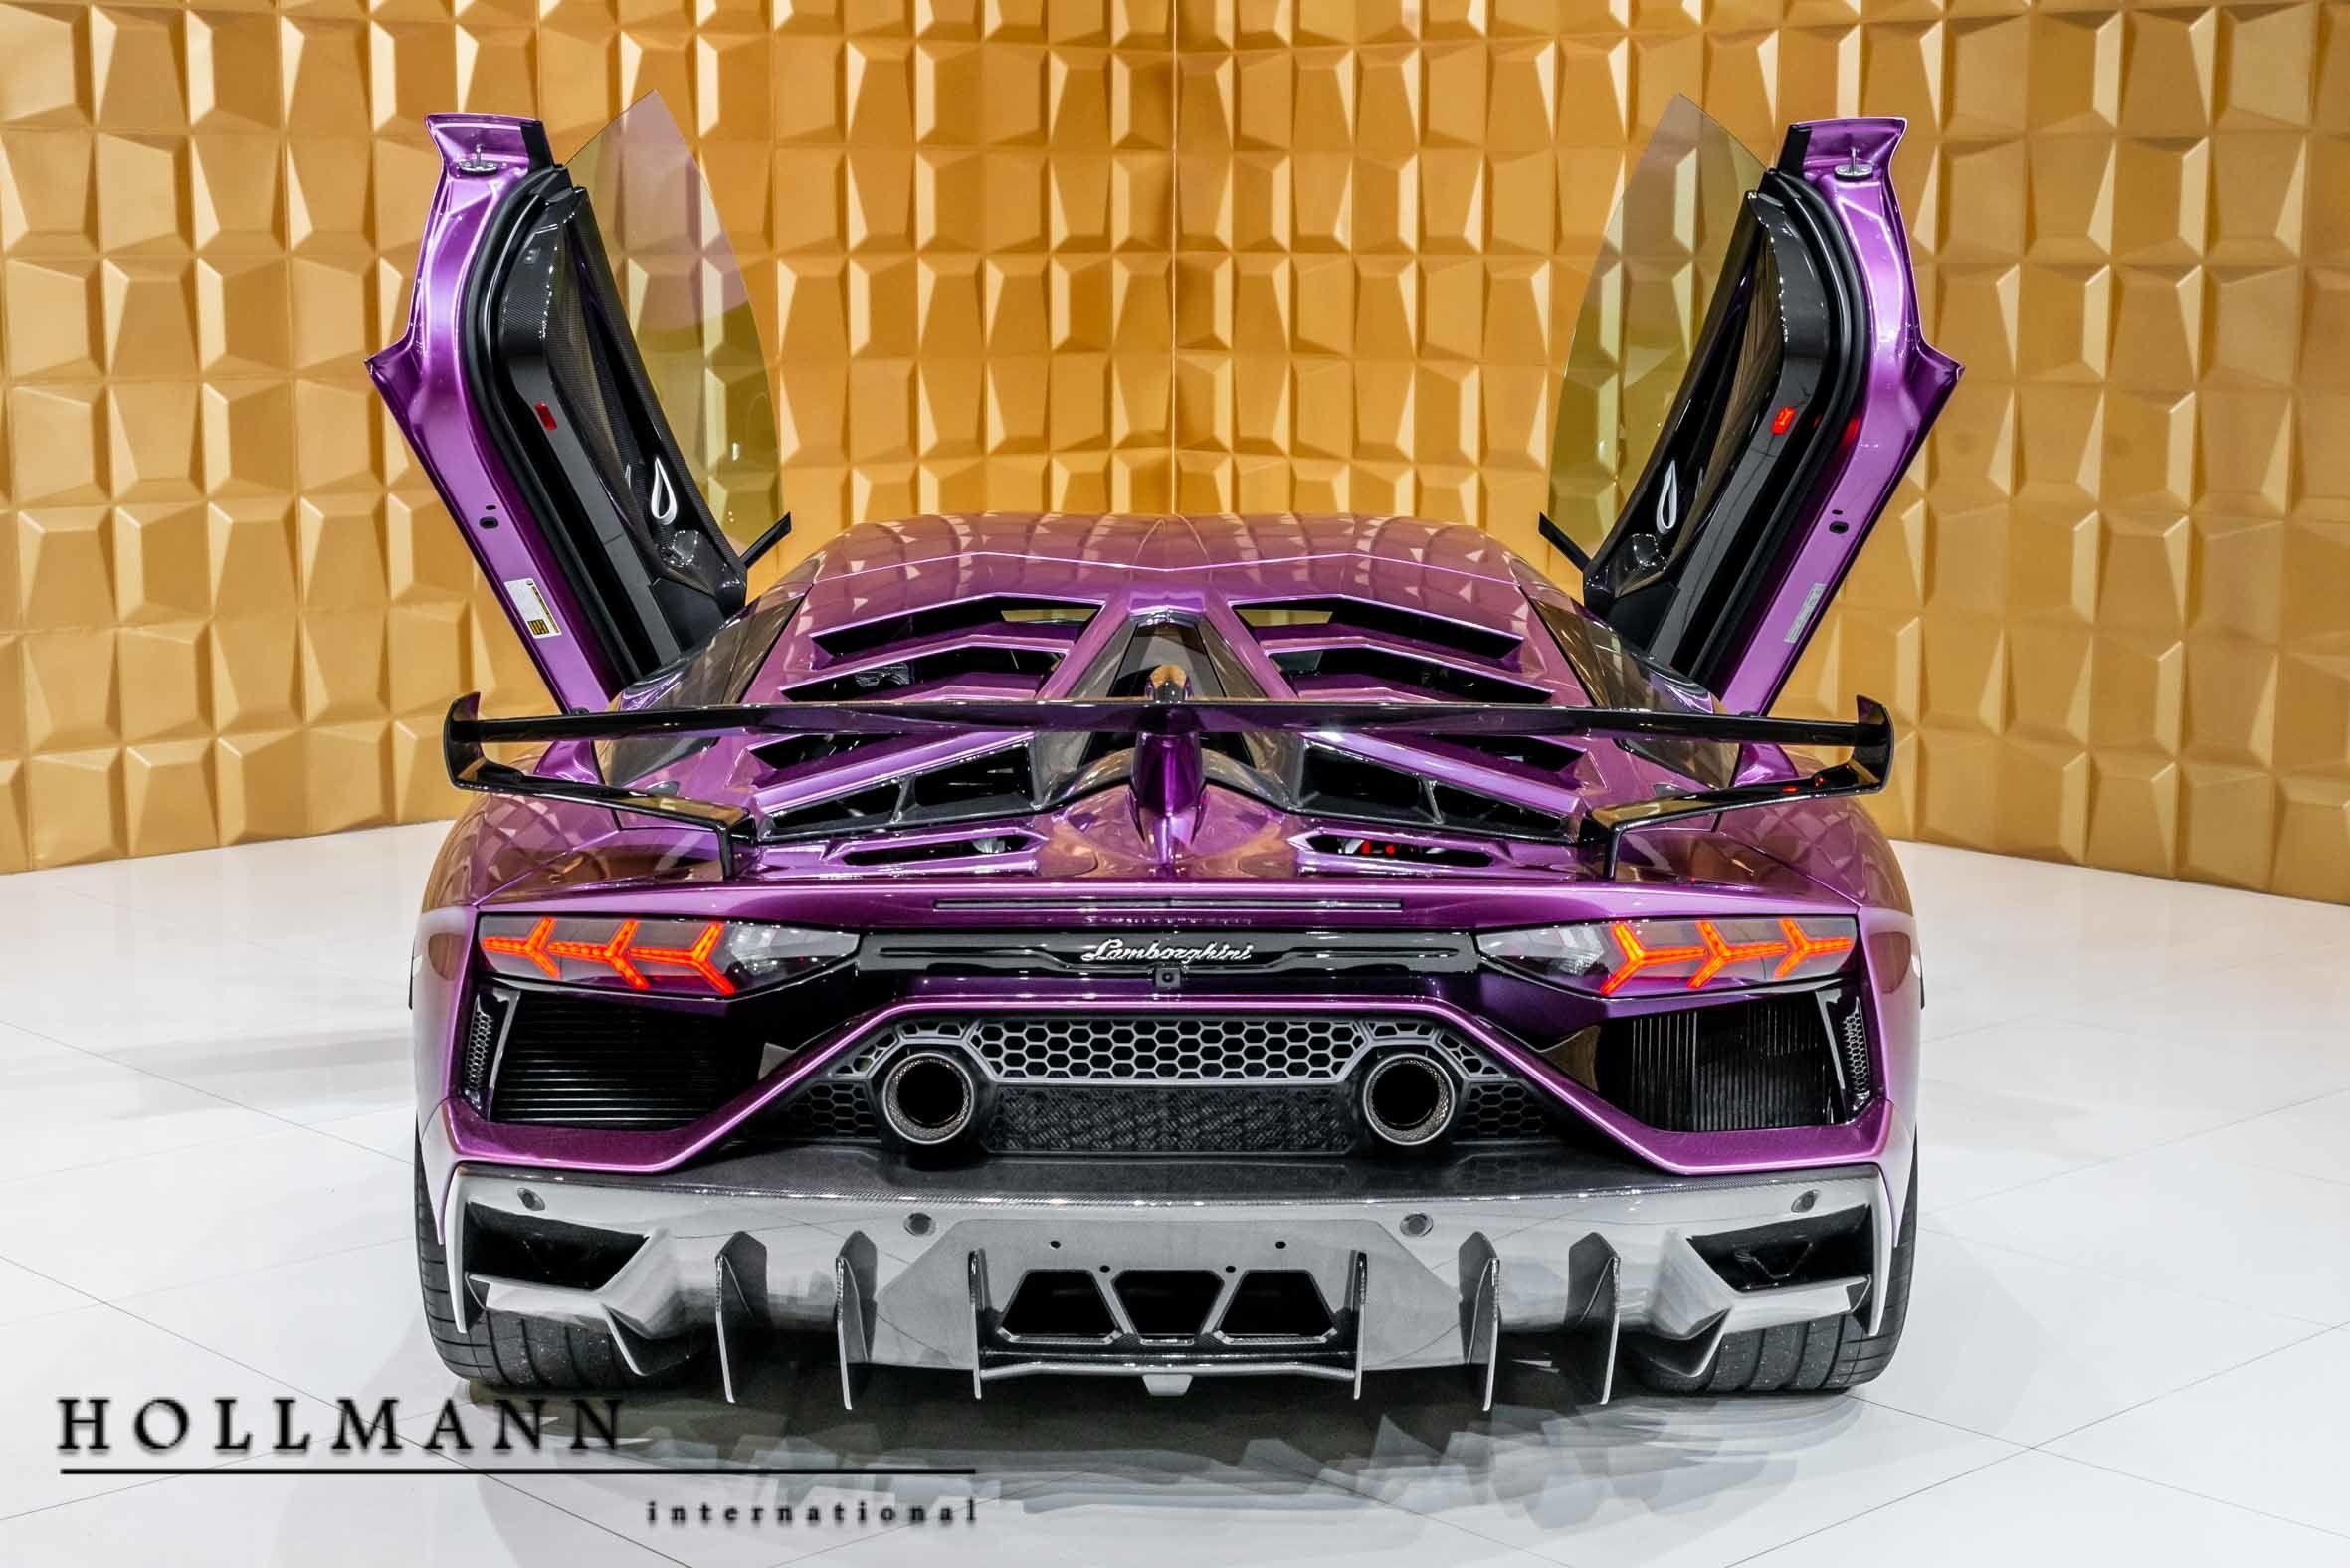 Lamborghini Aventador Svj Luxury Pulse Cars Germany For Sale On Luxurypulse Lamborghini Aventador Lamborghini Luxury Cars